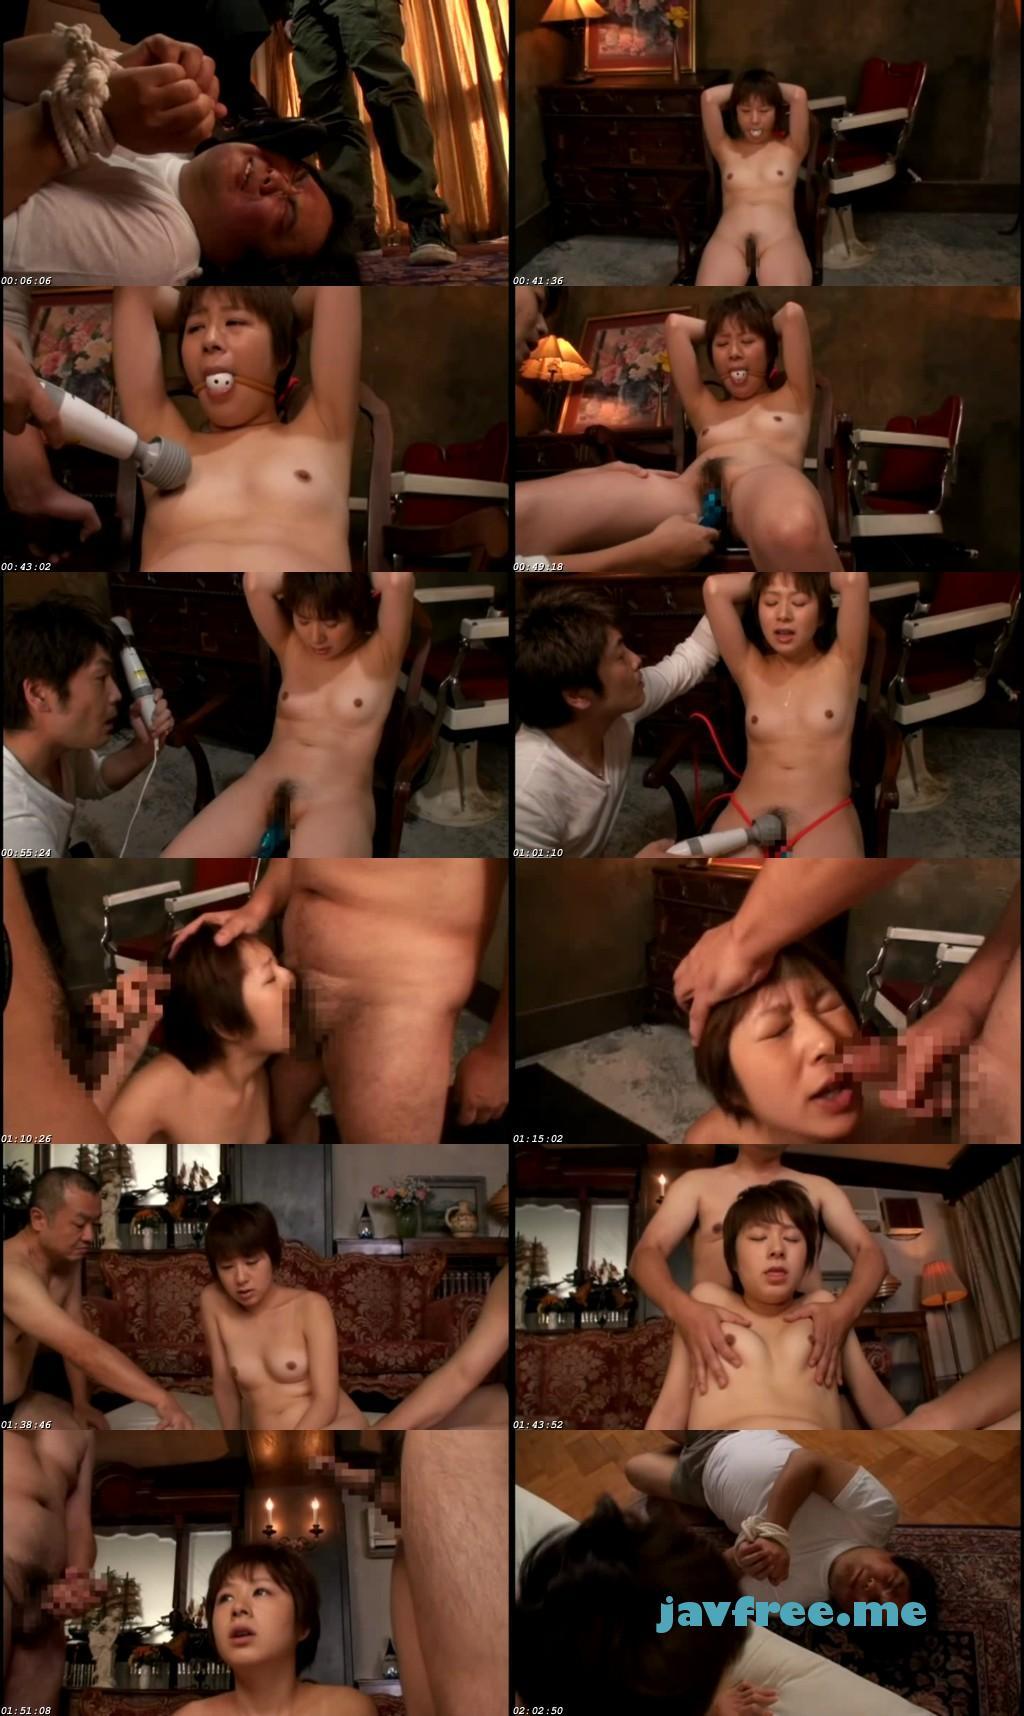 [APAG 002] 哀少女れみ 可憐な少女の肢体は、ケモノ達に汚され散らされる…。 生駒レミ 生駒レミ APAG